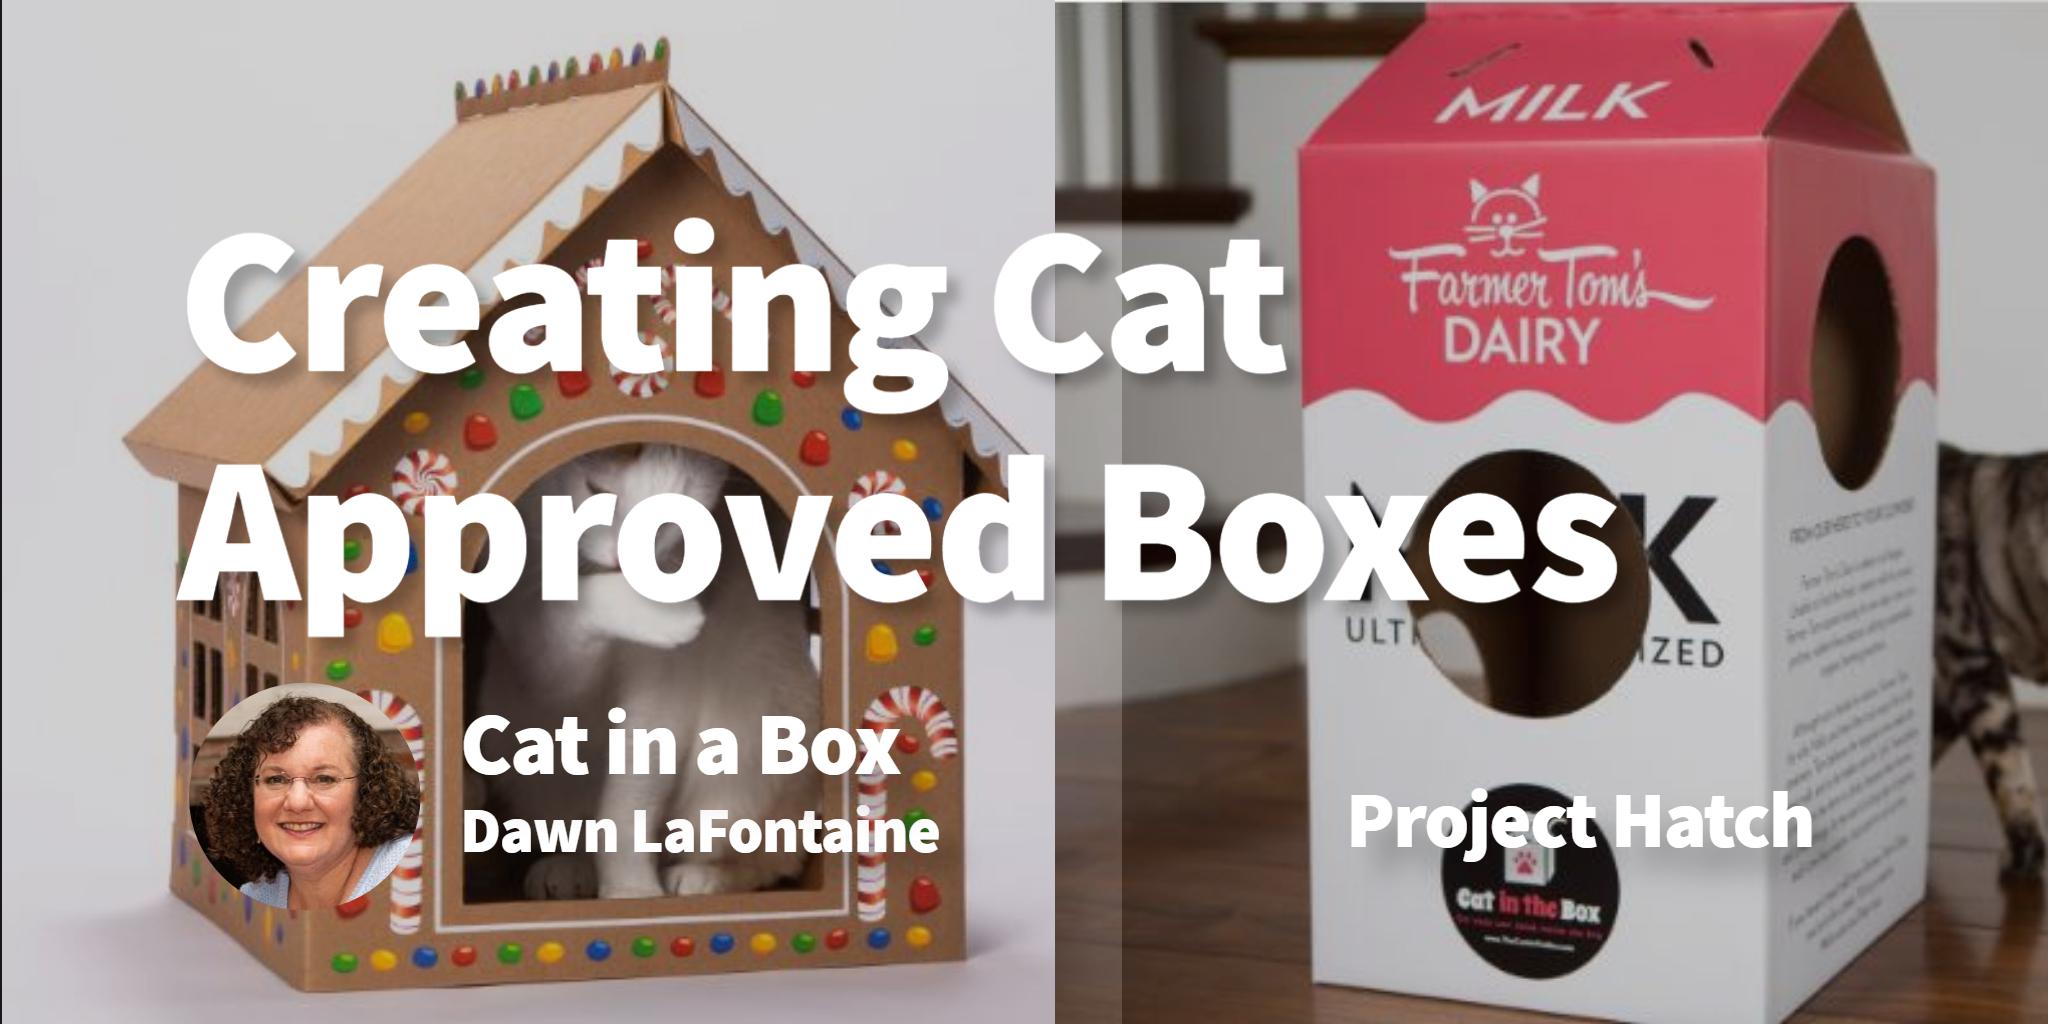 Cat in a Box Dawn LaFontaine